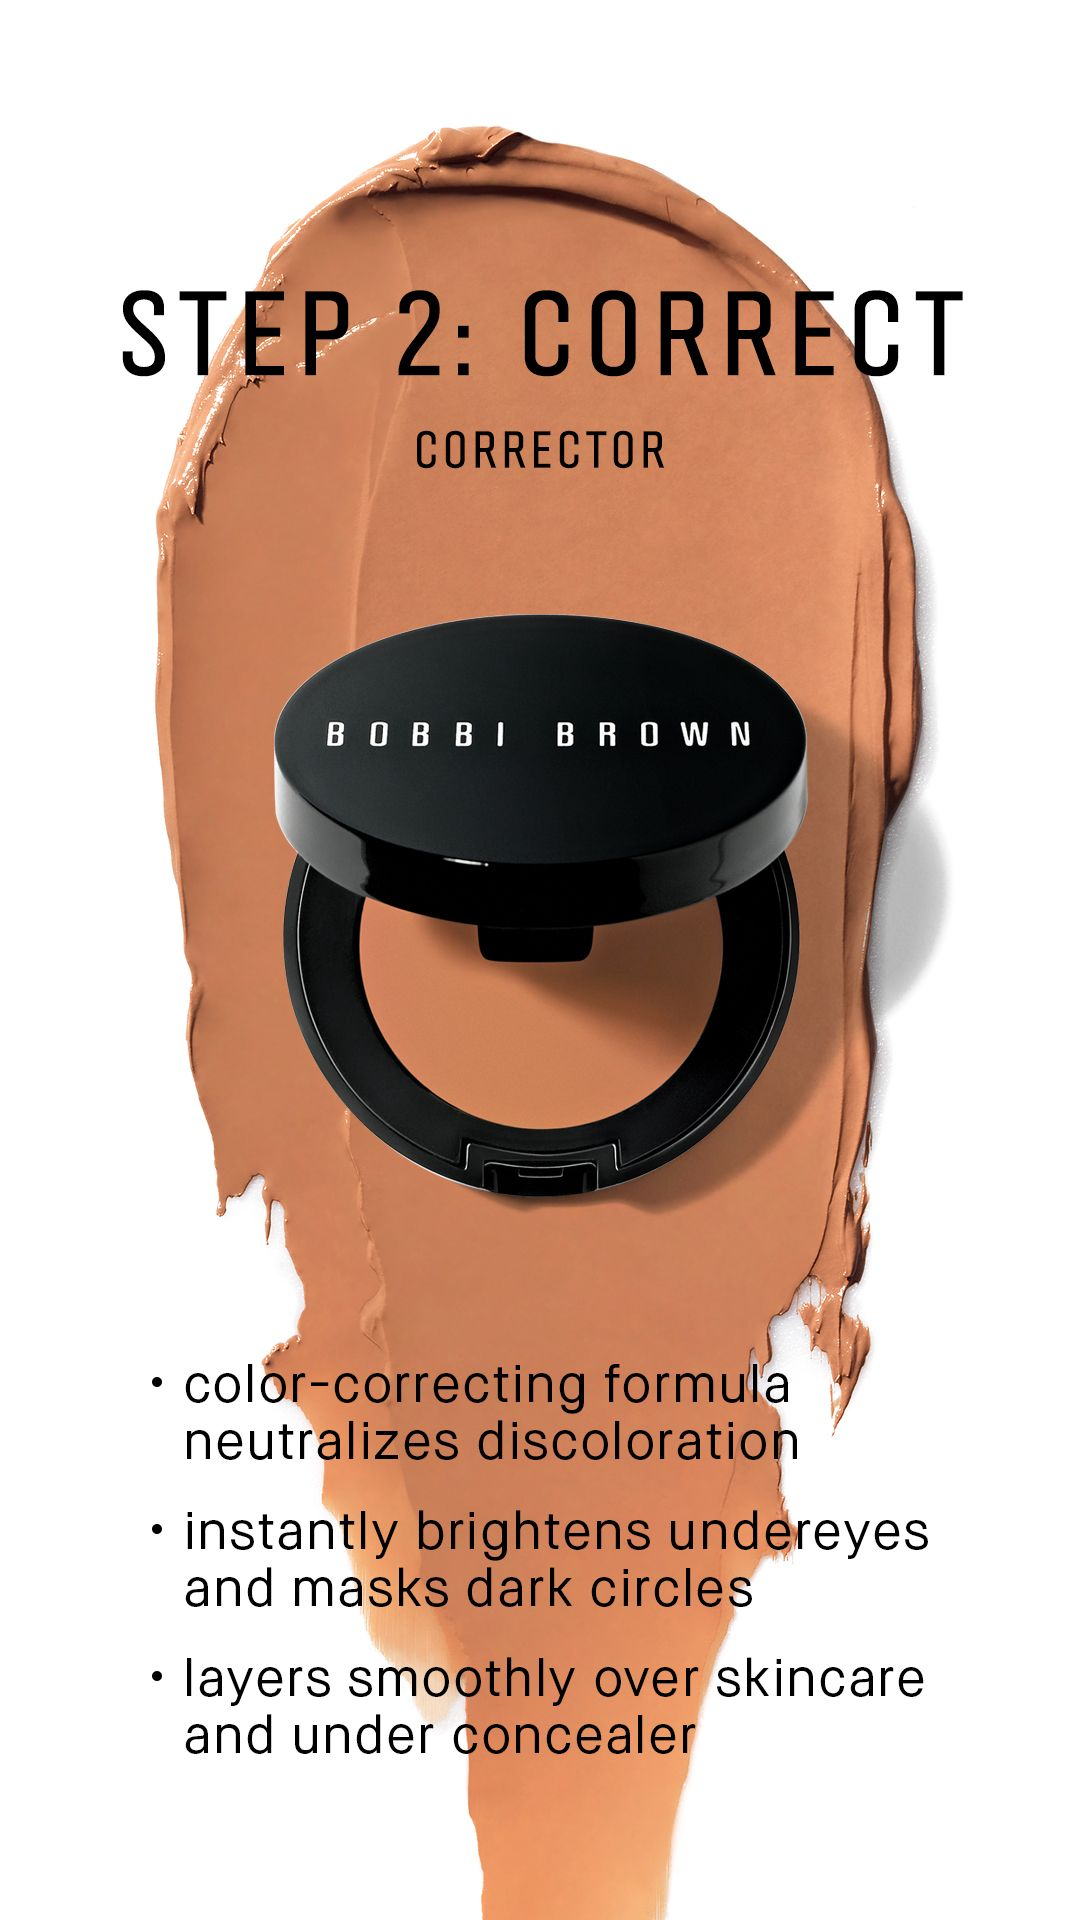 Corrector (With images) | Dark circles under eyes, Dark ...